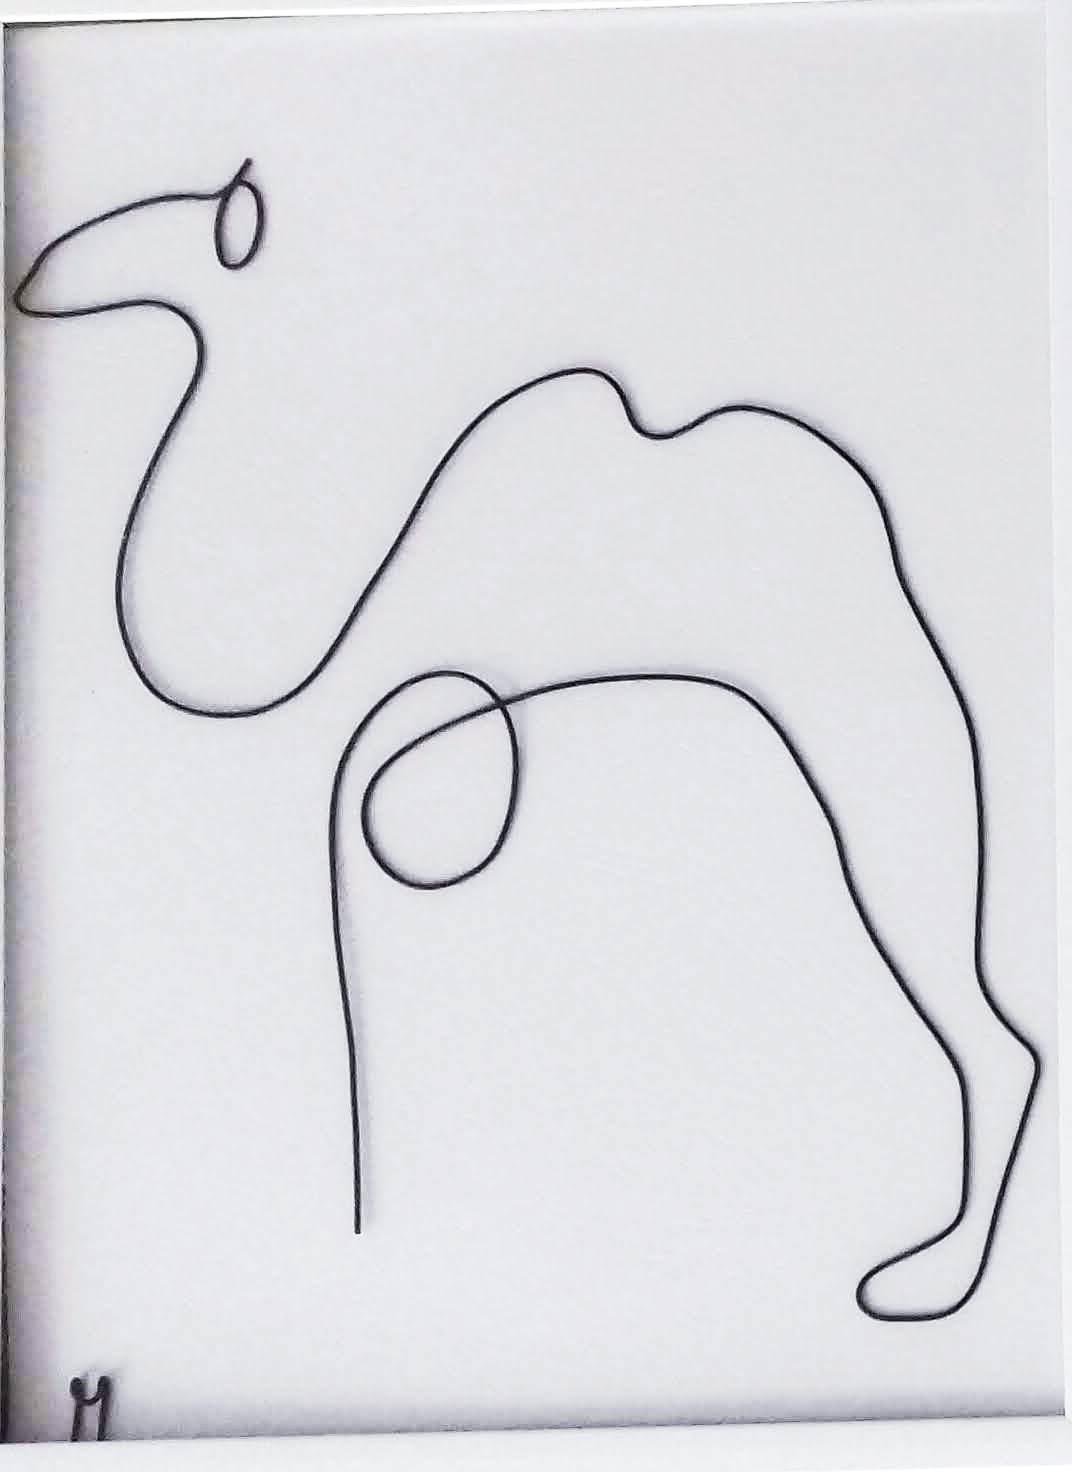 Picasso Penguin 20181018_114507-1